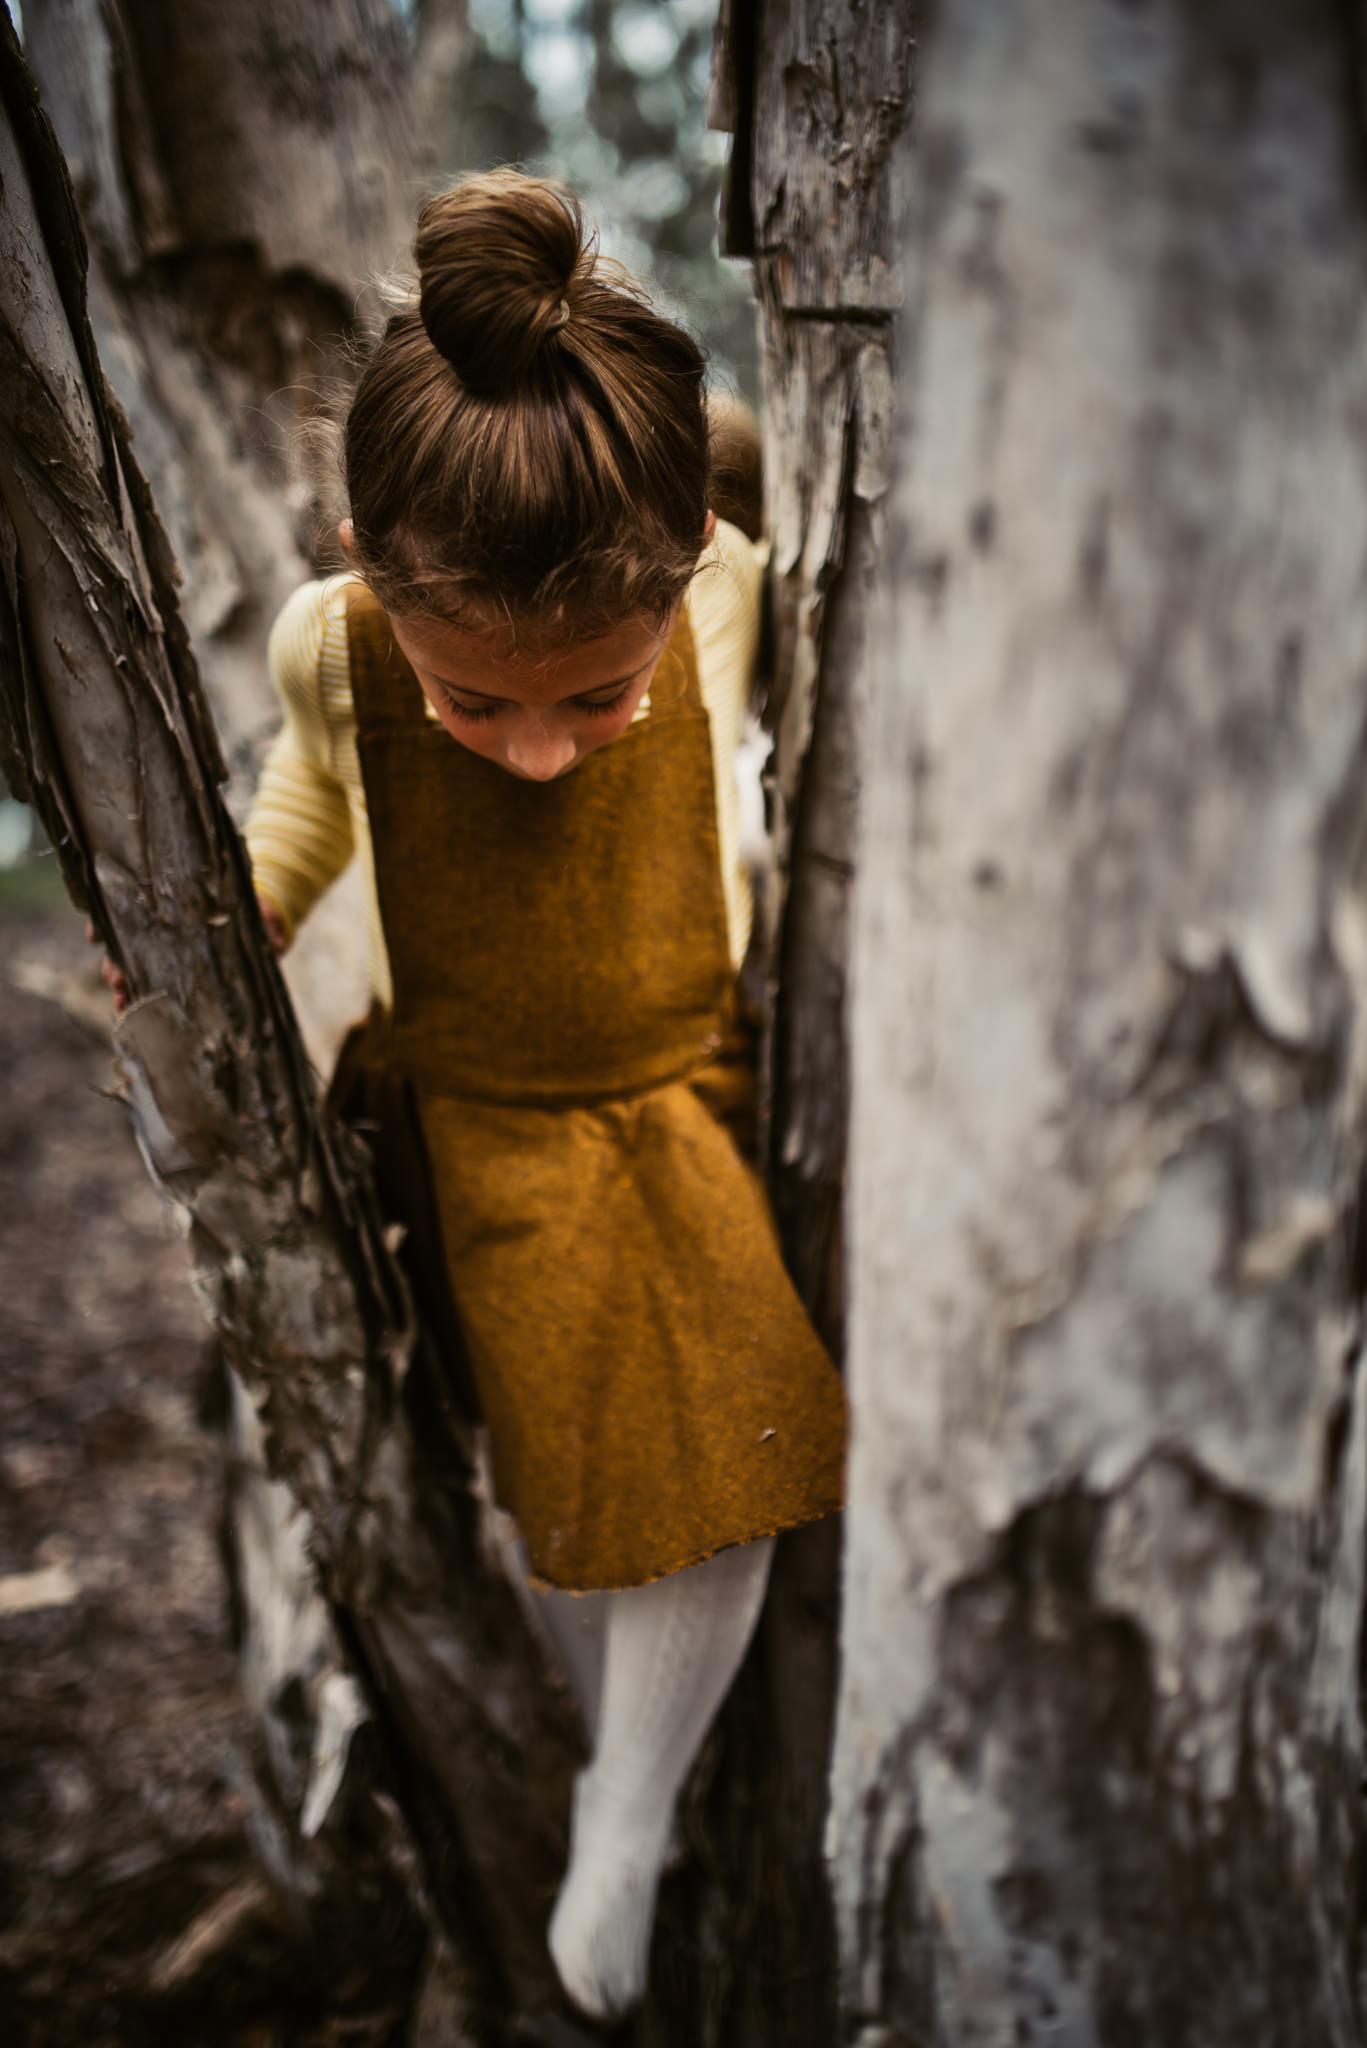 twyla jones photography - treasure coast florida - childrens adventure clothing commercial shoot--15.jpg